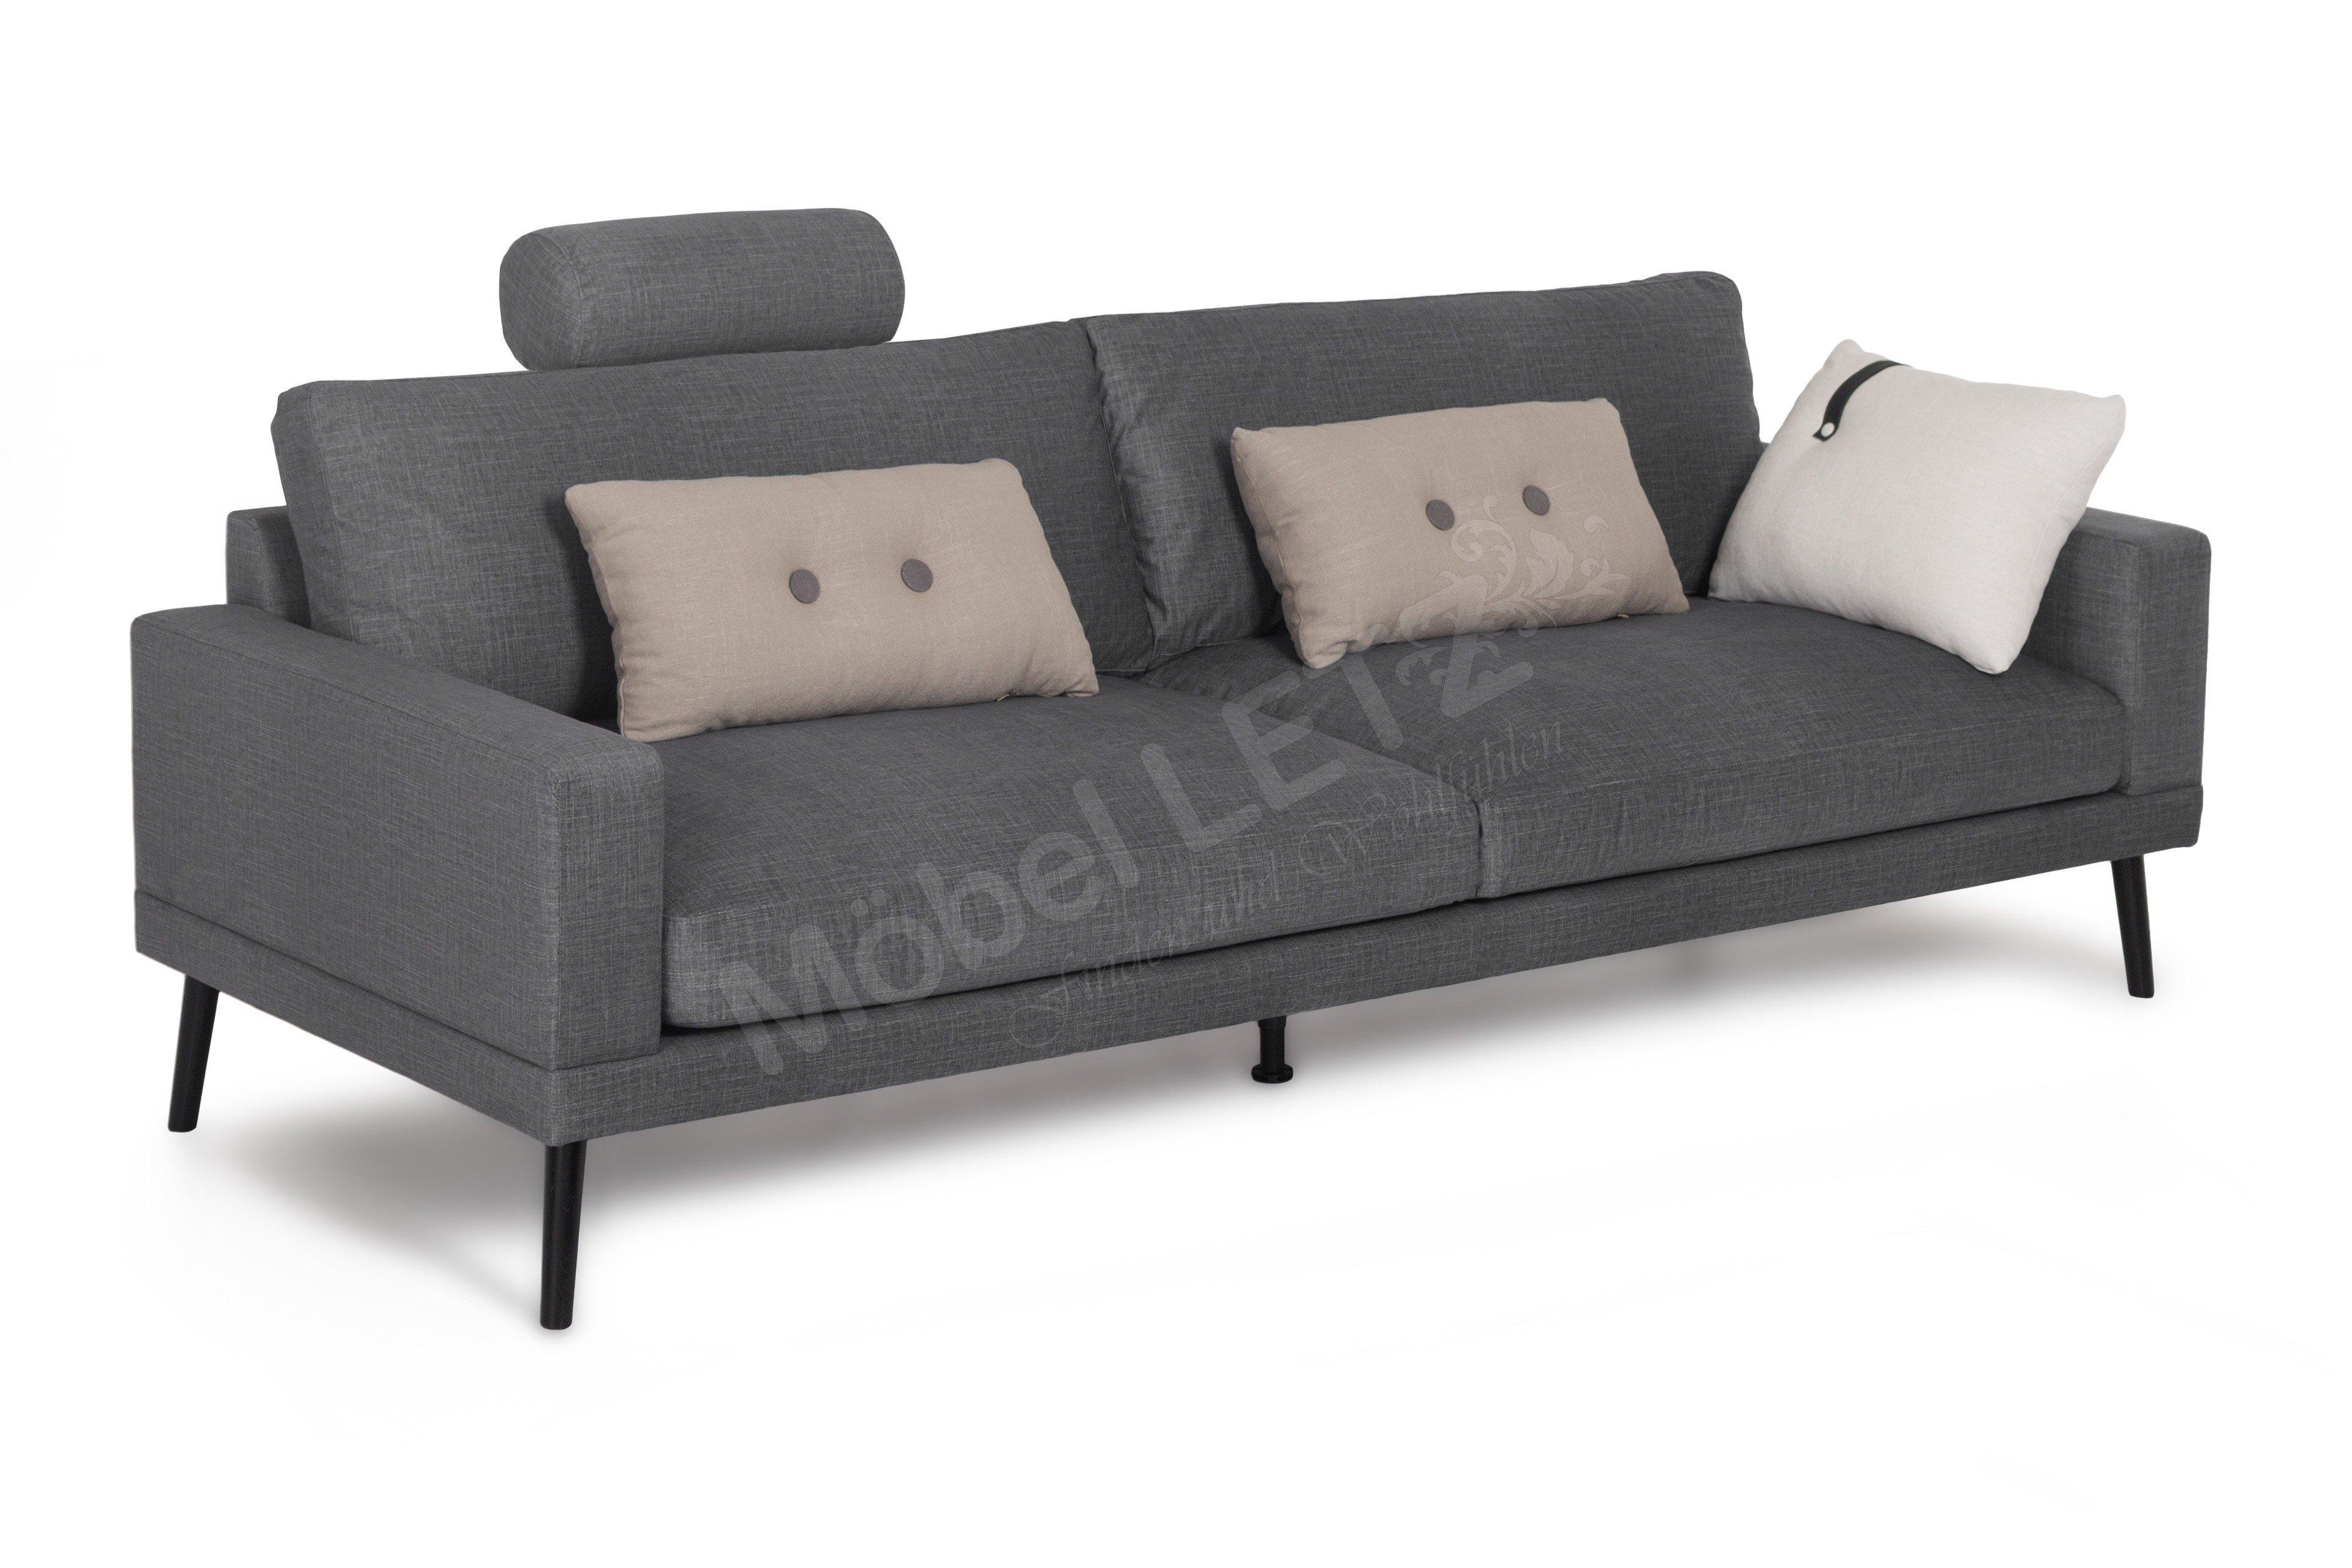 Skandinavische Möbel Davin Einzelsofa In Grau